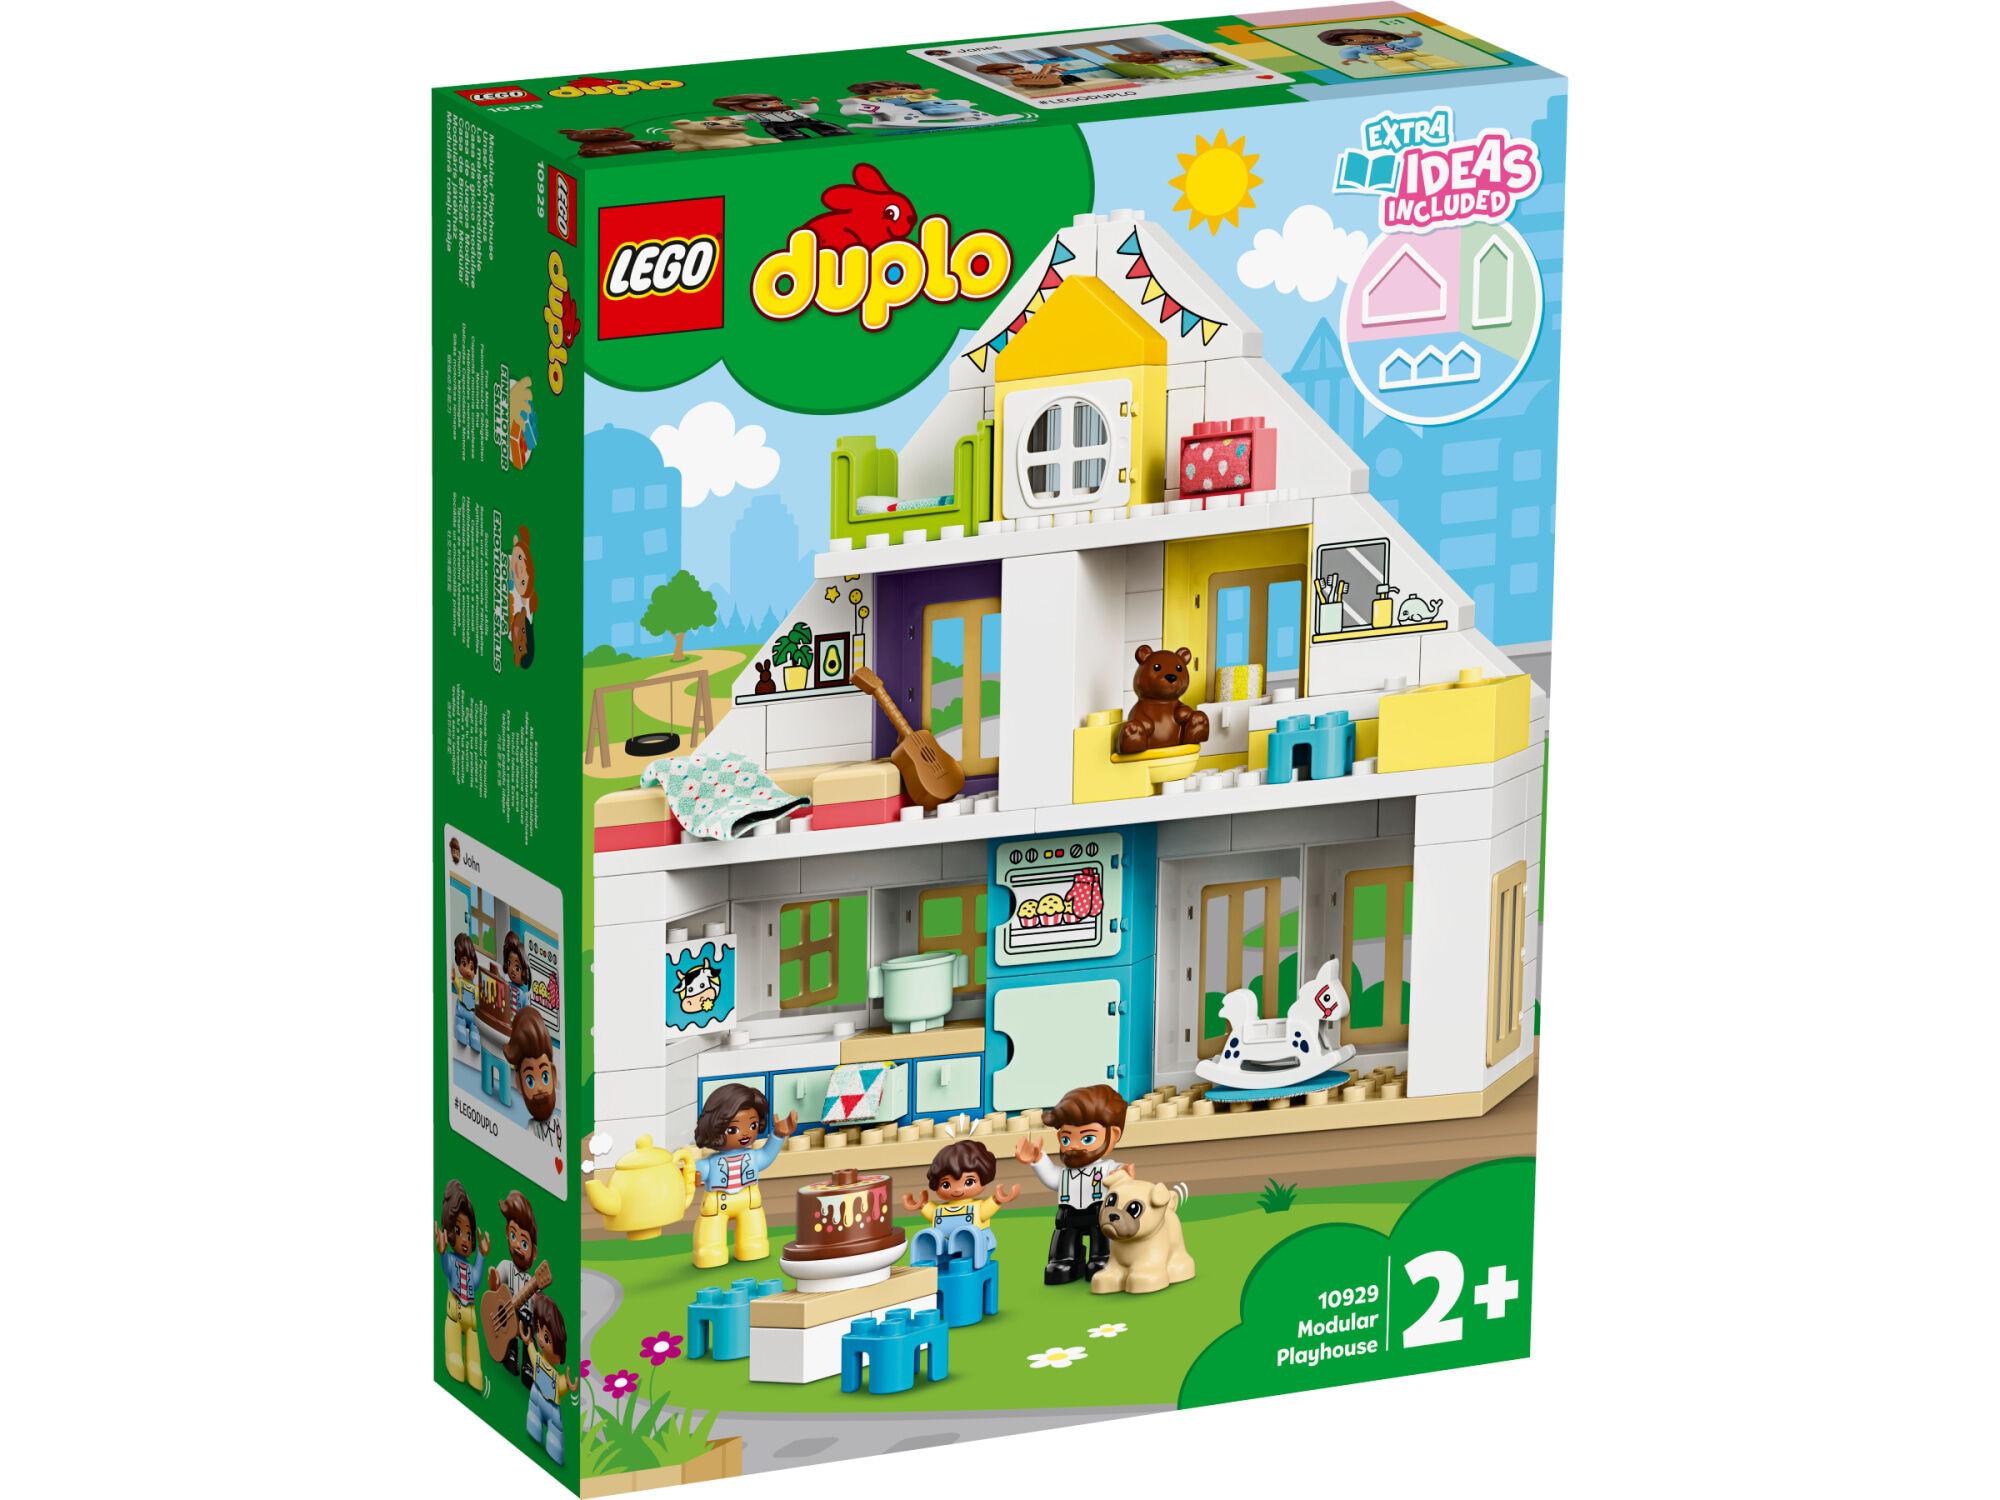 Lego DUPLO Town 10929 Moduulileikkimökki